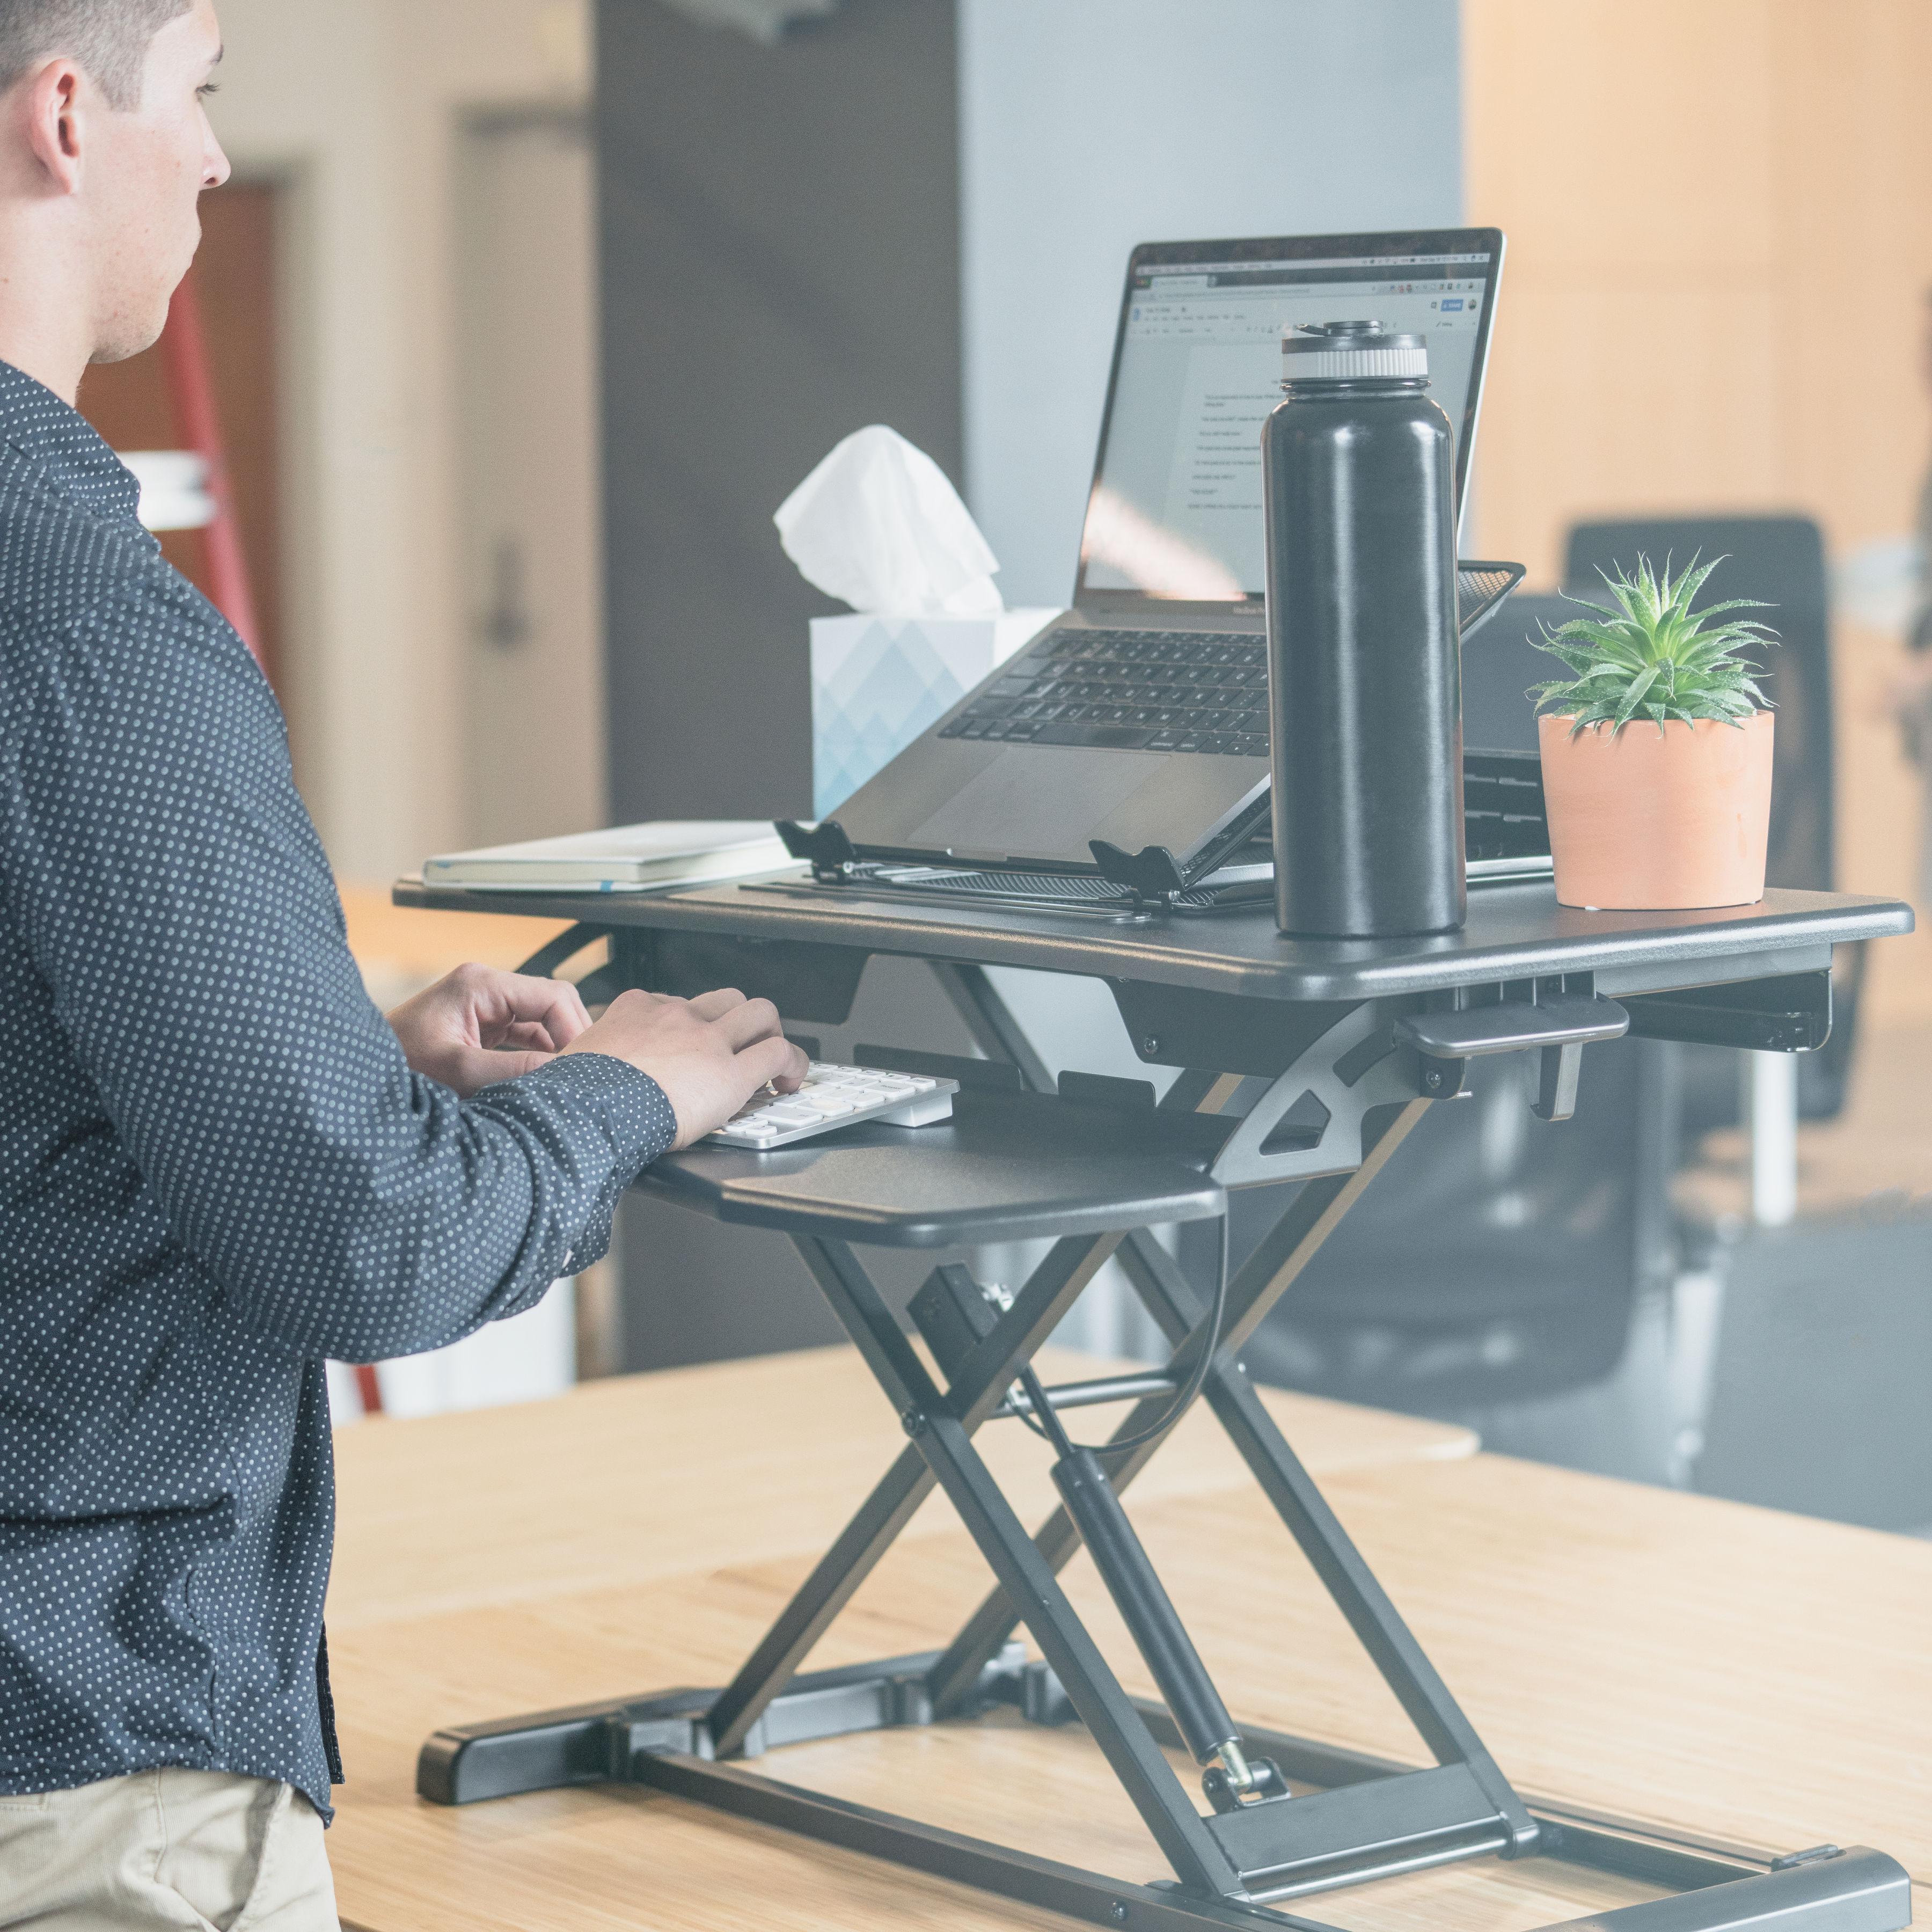 Rise-X-Light-Standing-Desk-Stand-Up-Desk-Height-Adjustable-Desk-Converter thumbnail 10